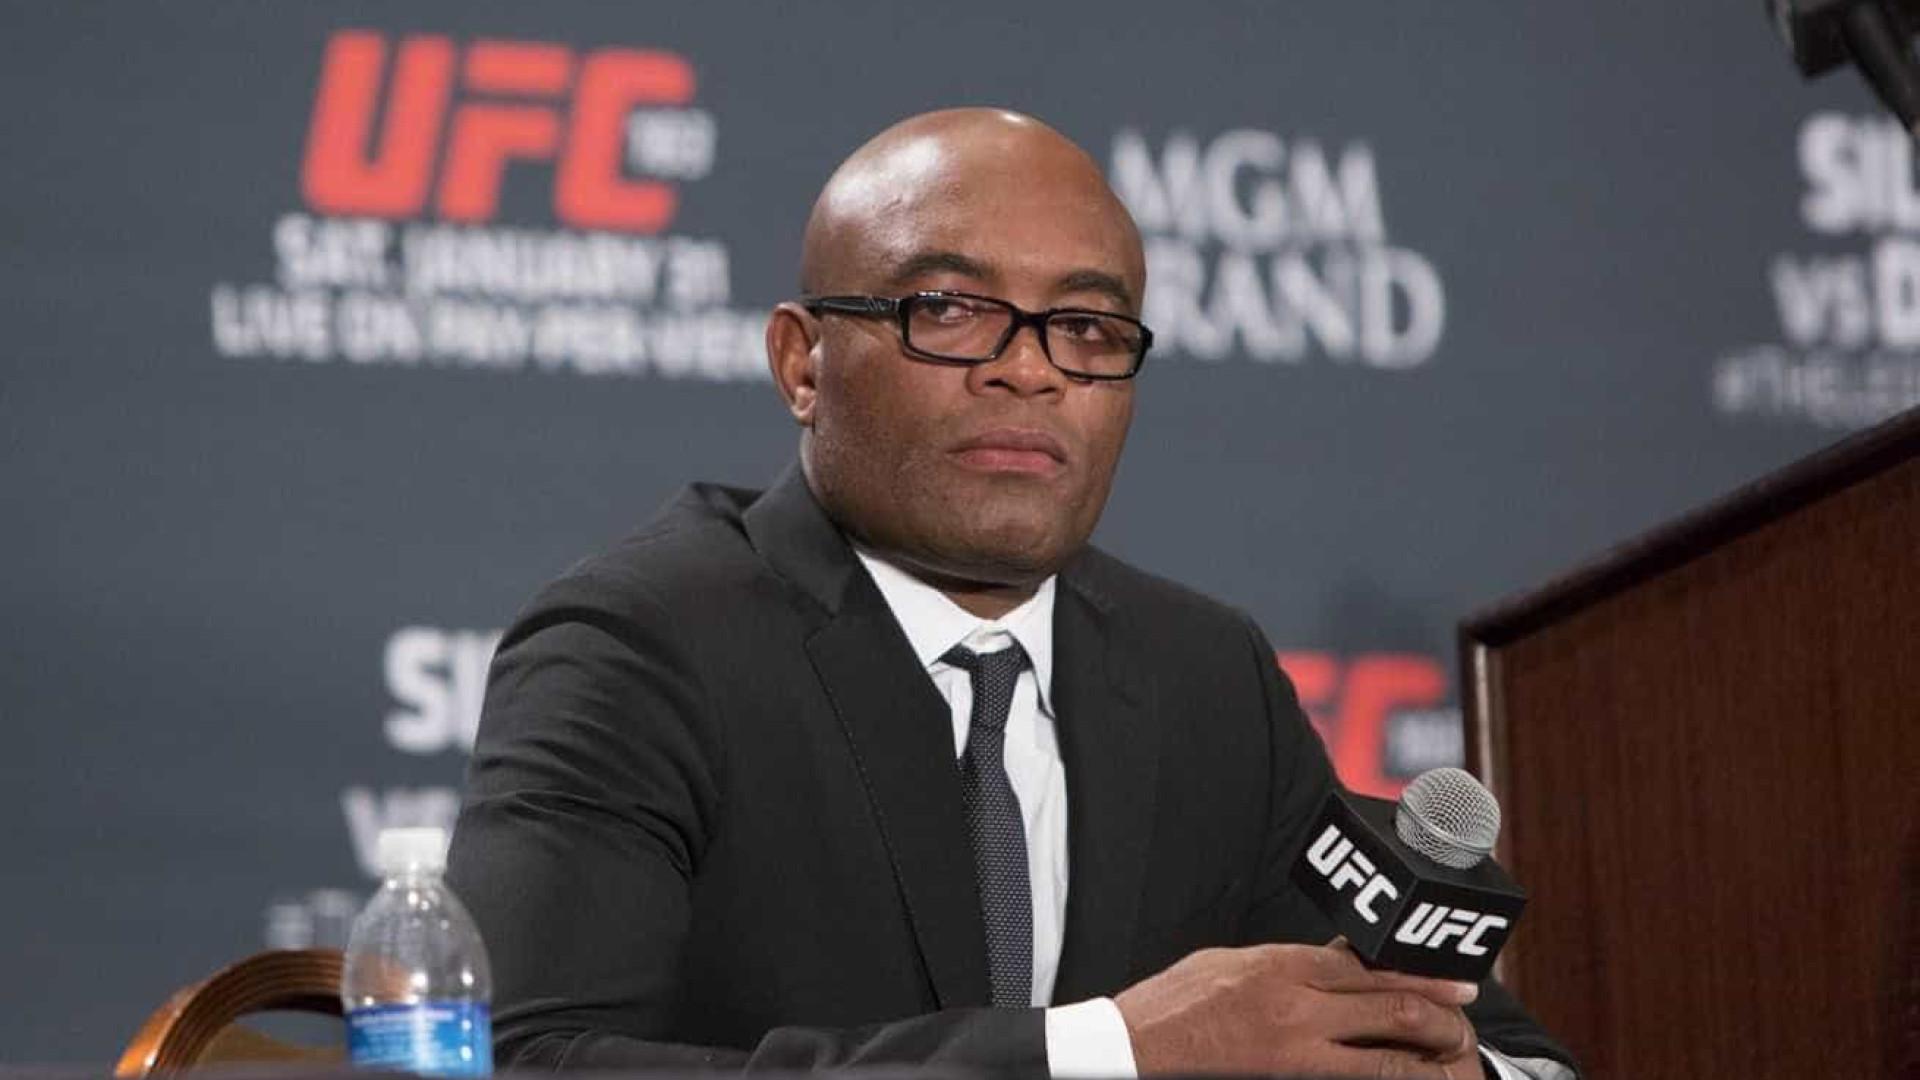 Anderson Silva volta atrás de aposentadoria: 'Capaz de seguir competindo no MMA'